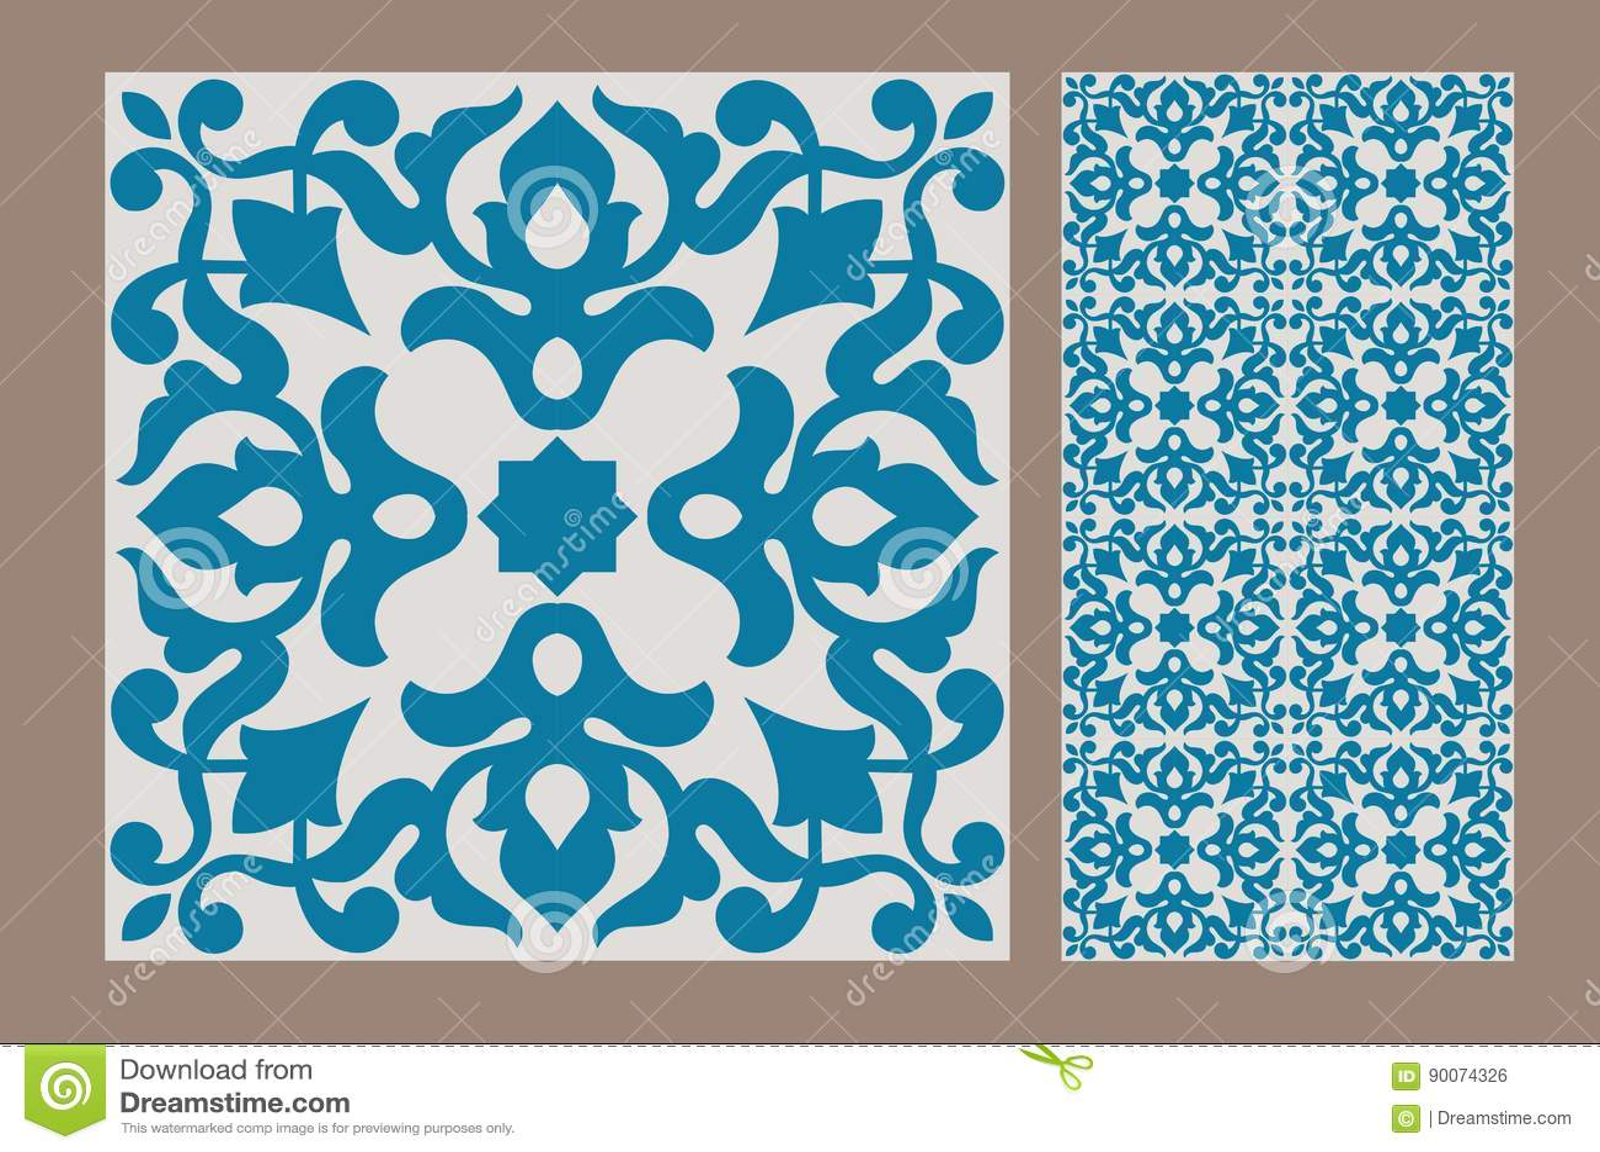 Vintage tile stock vector. Illustration of craft, covering - 90074326